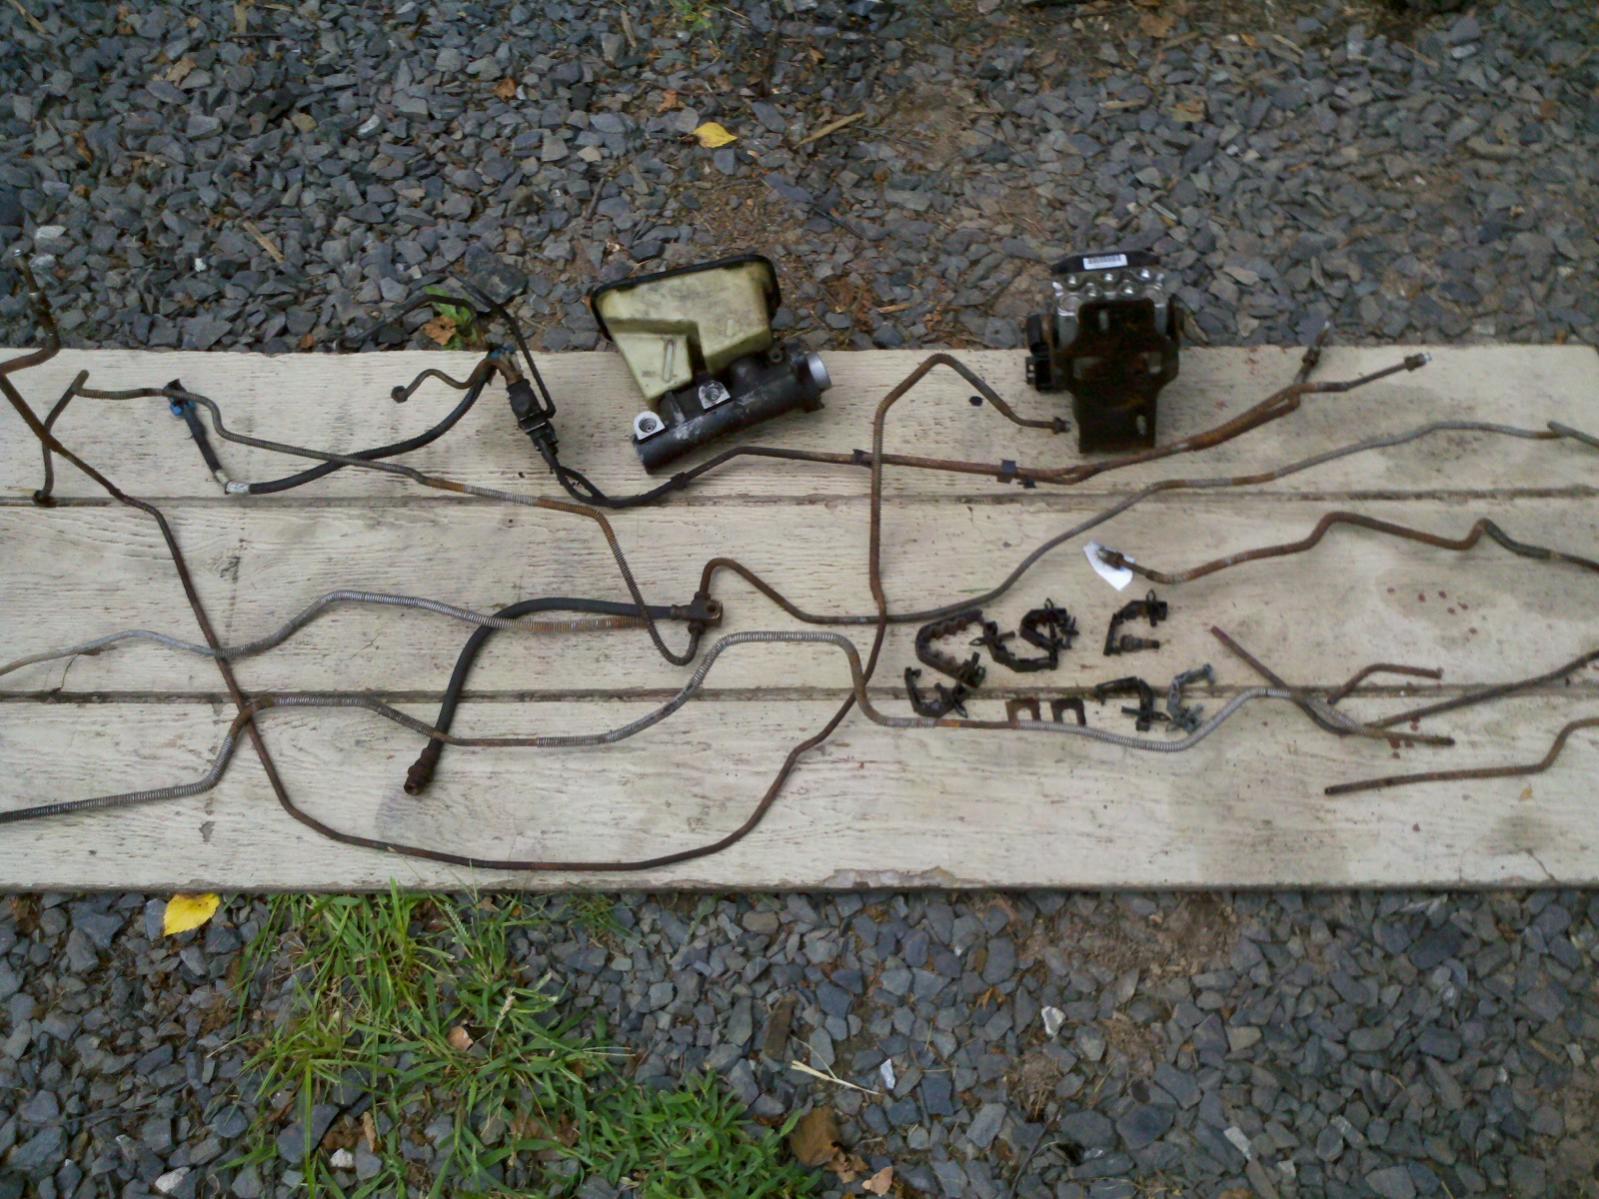 1999 chevy silverado brake line diagram honda xrm 125 motard wiring exact fit pre bent chevrolet forum